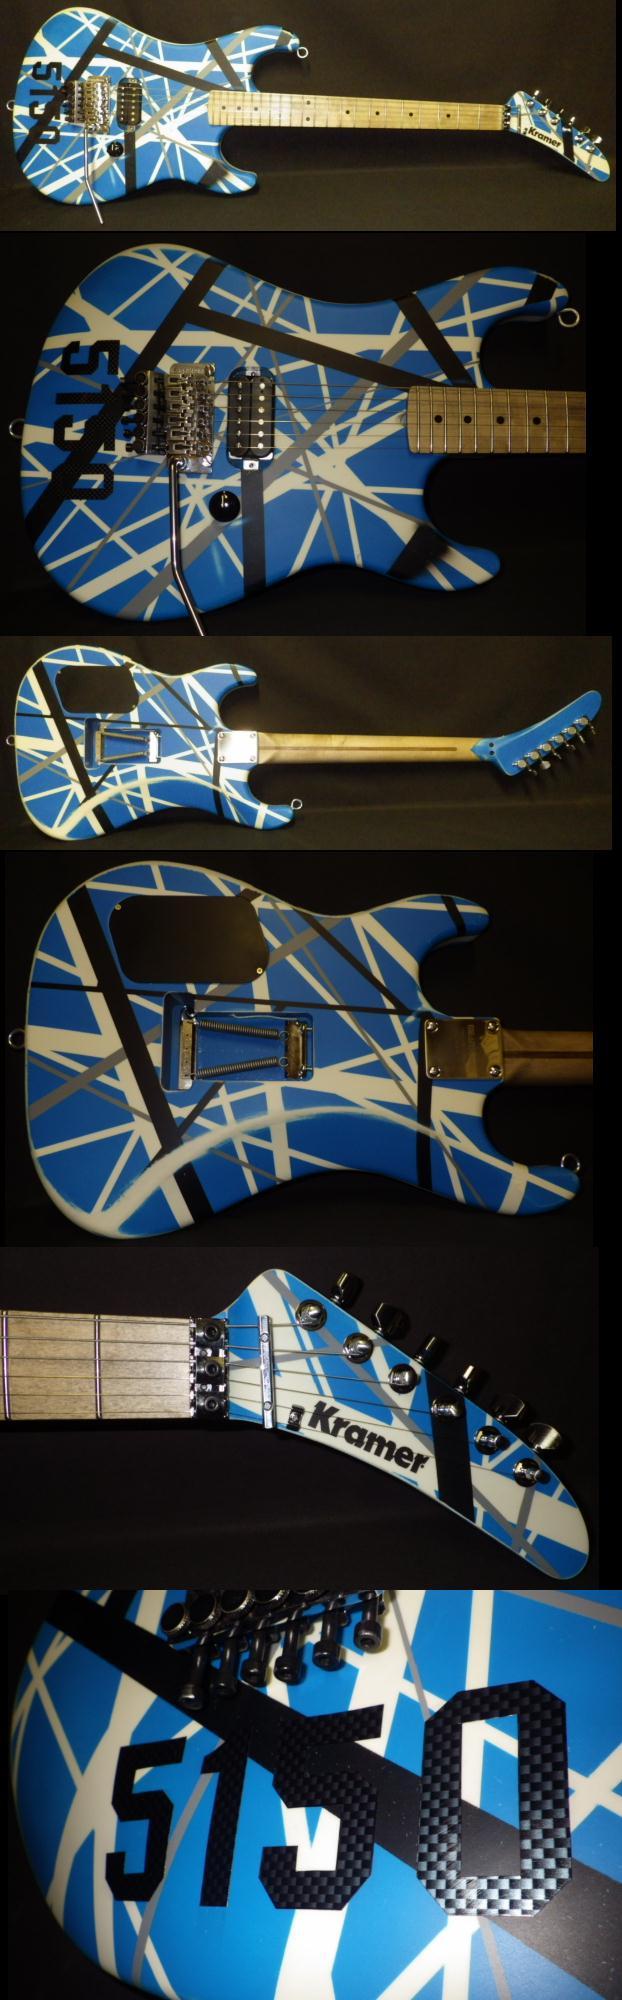 Mean Street Tour Model Blue 5150R Chris C.jpg